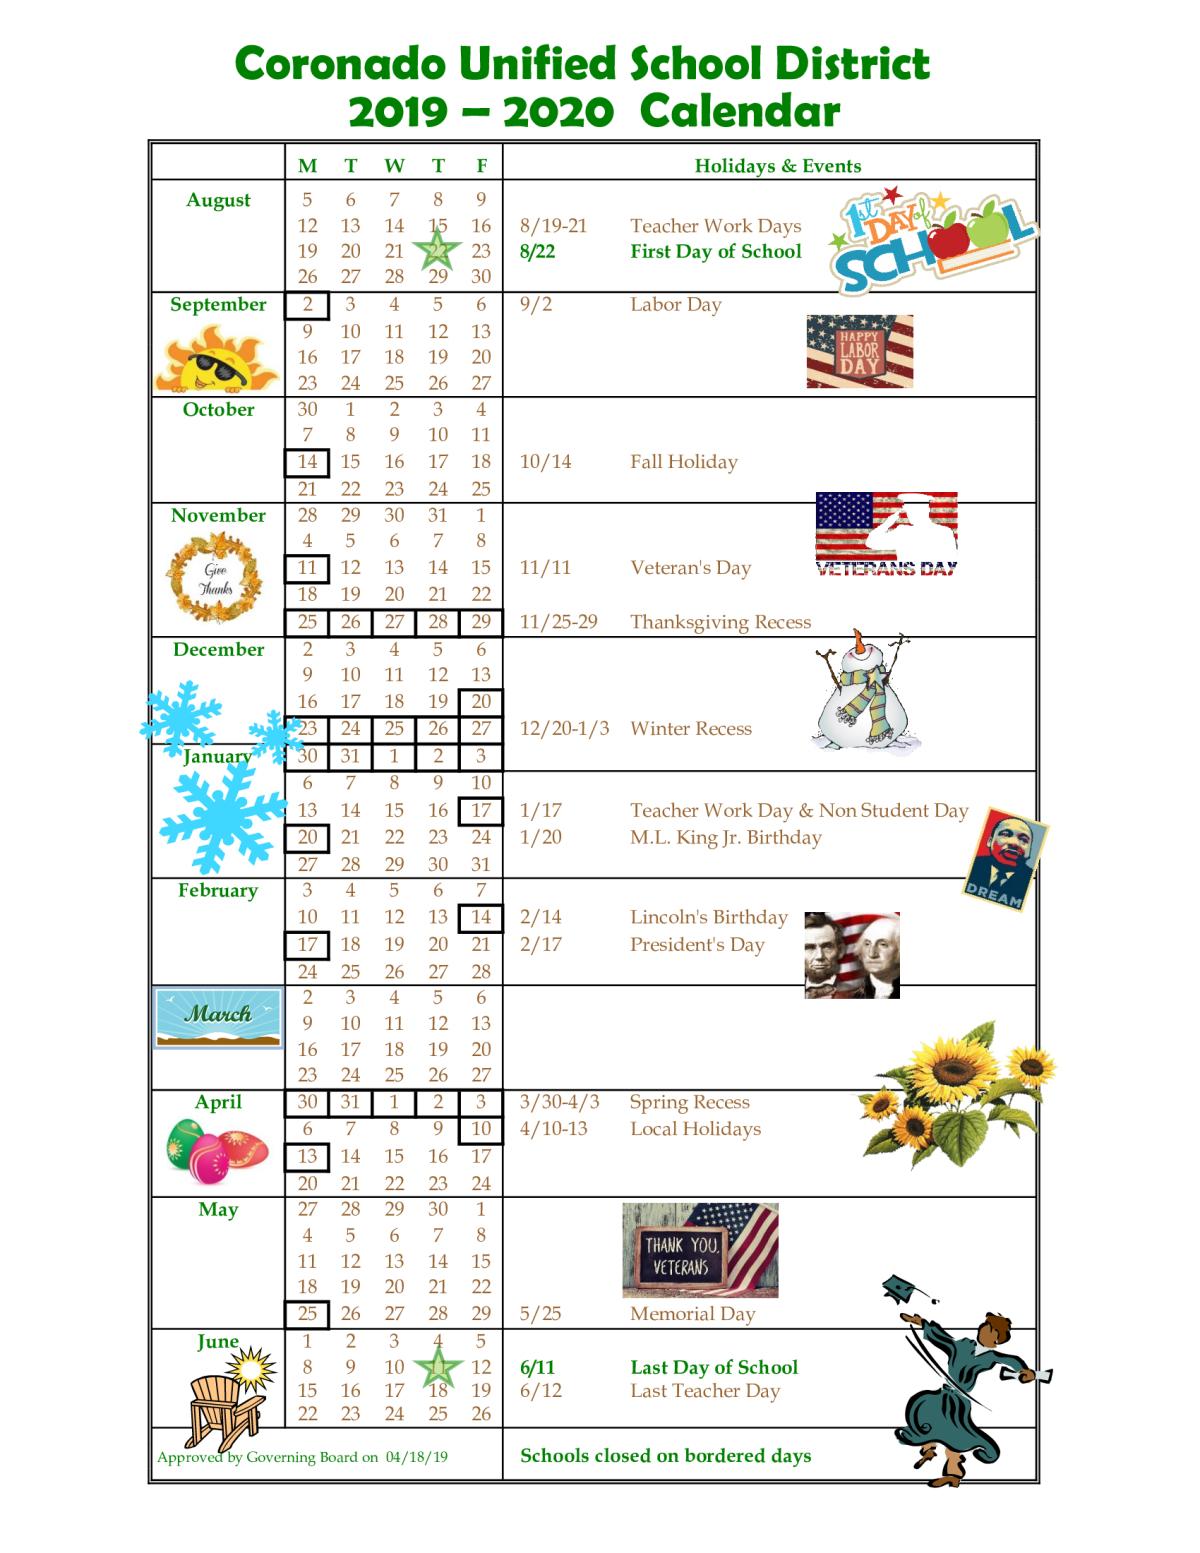 Cusd Calendar For 2019 2020 | Coronado Middle School Inside Grossmont High School Academic Calendar